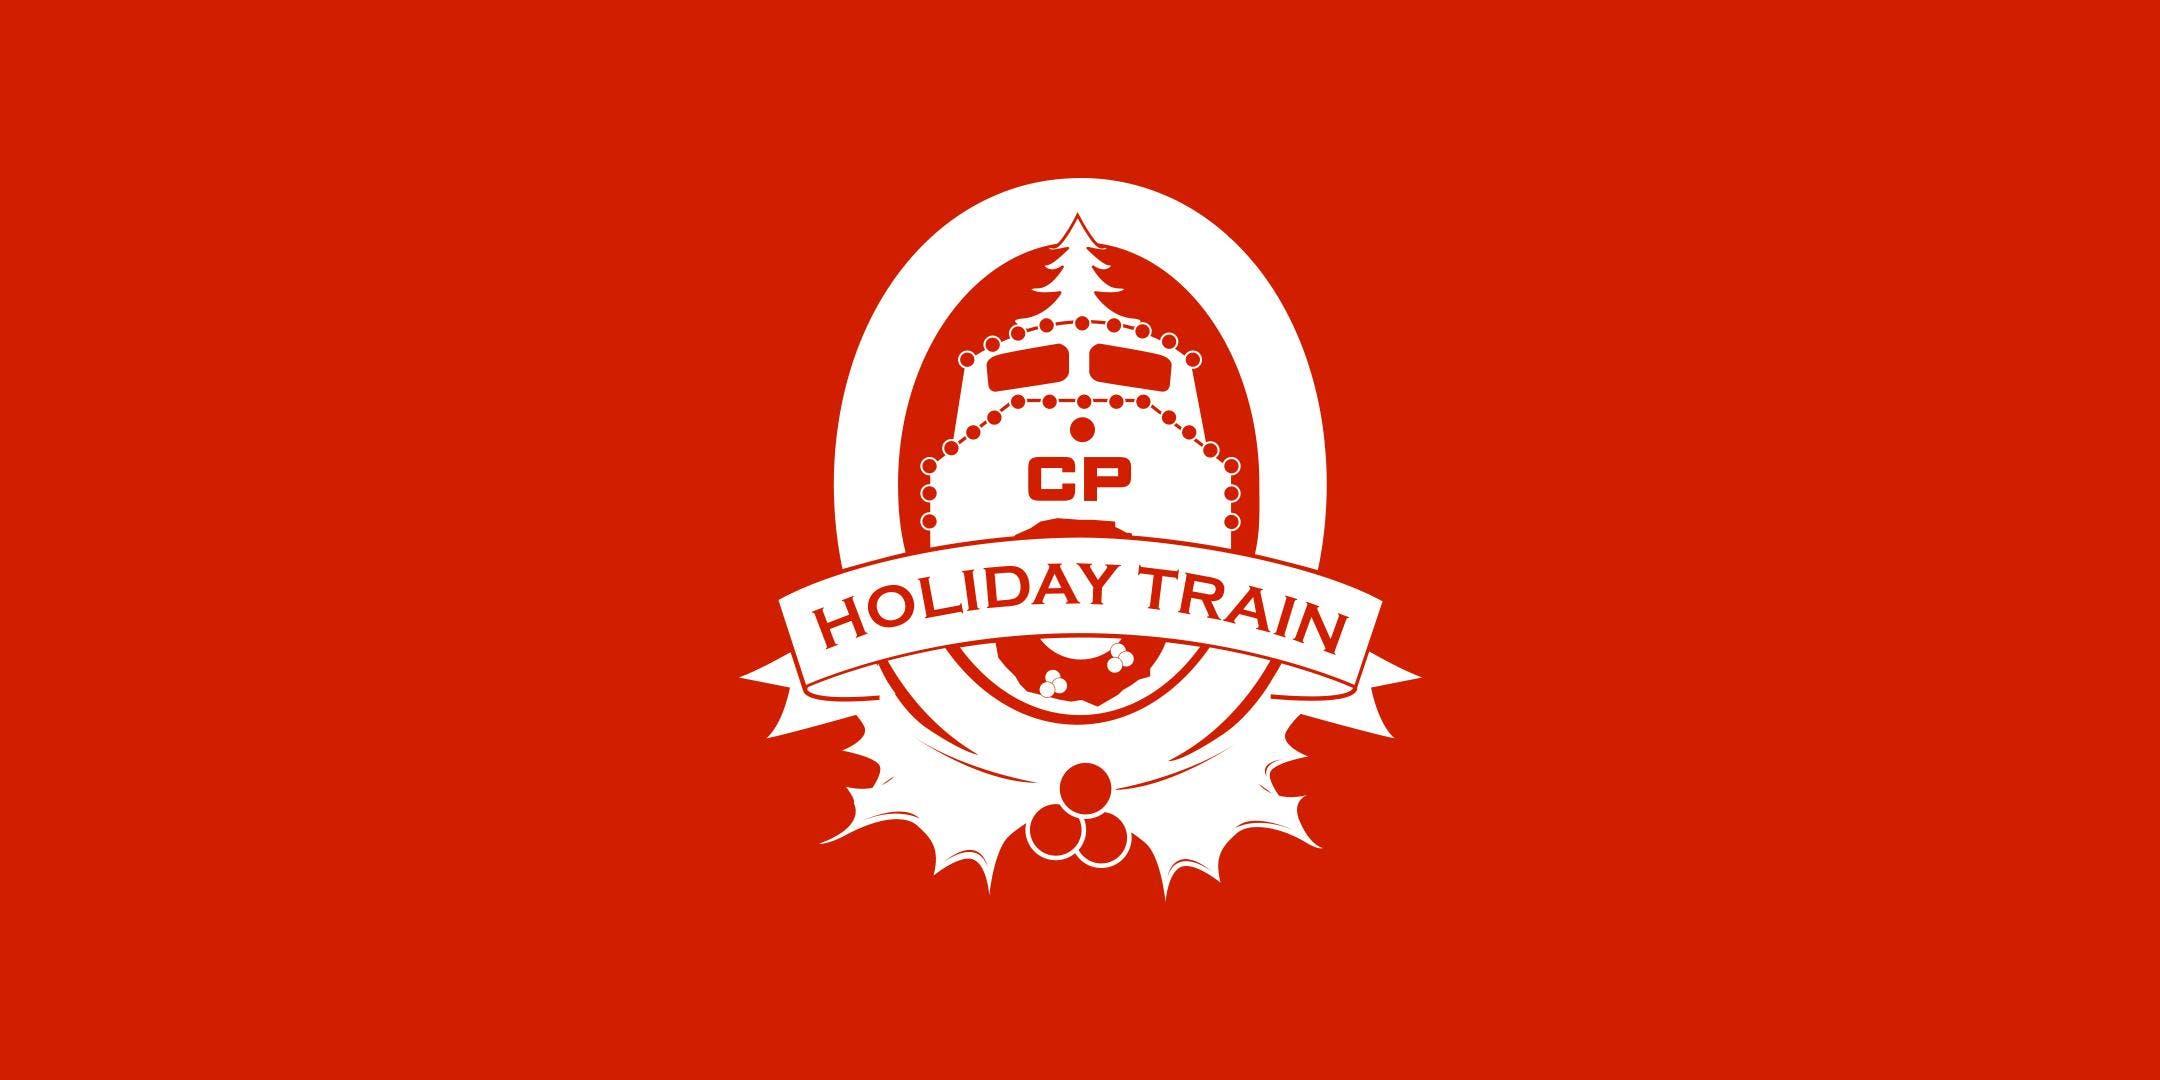 CP Holiday Train 2018 - Bethel Transit Centre